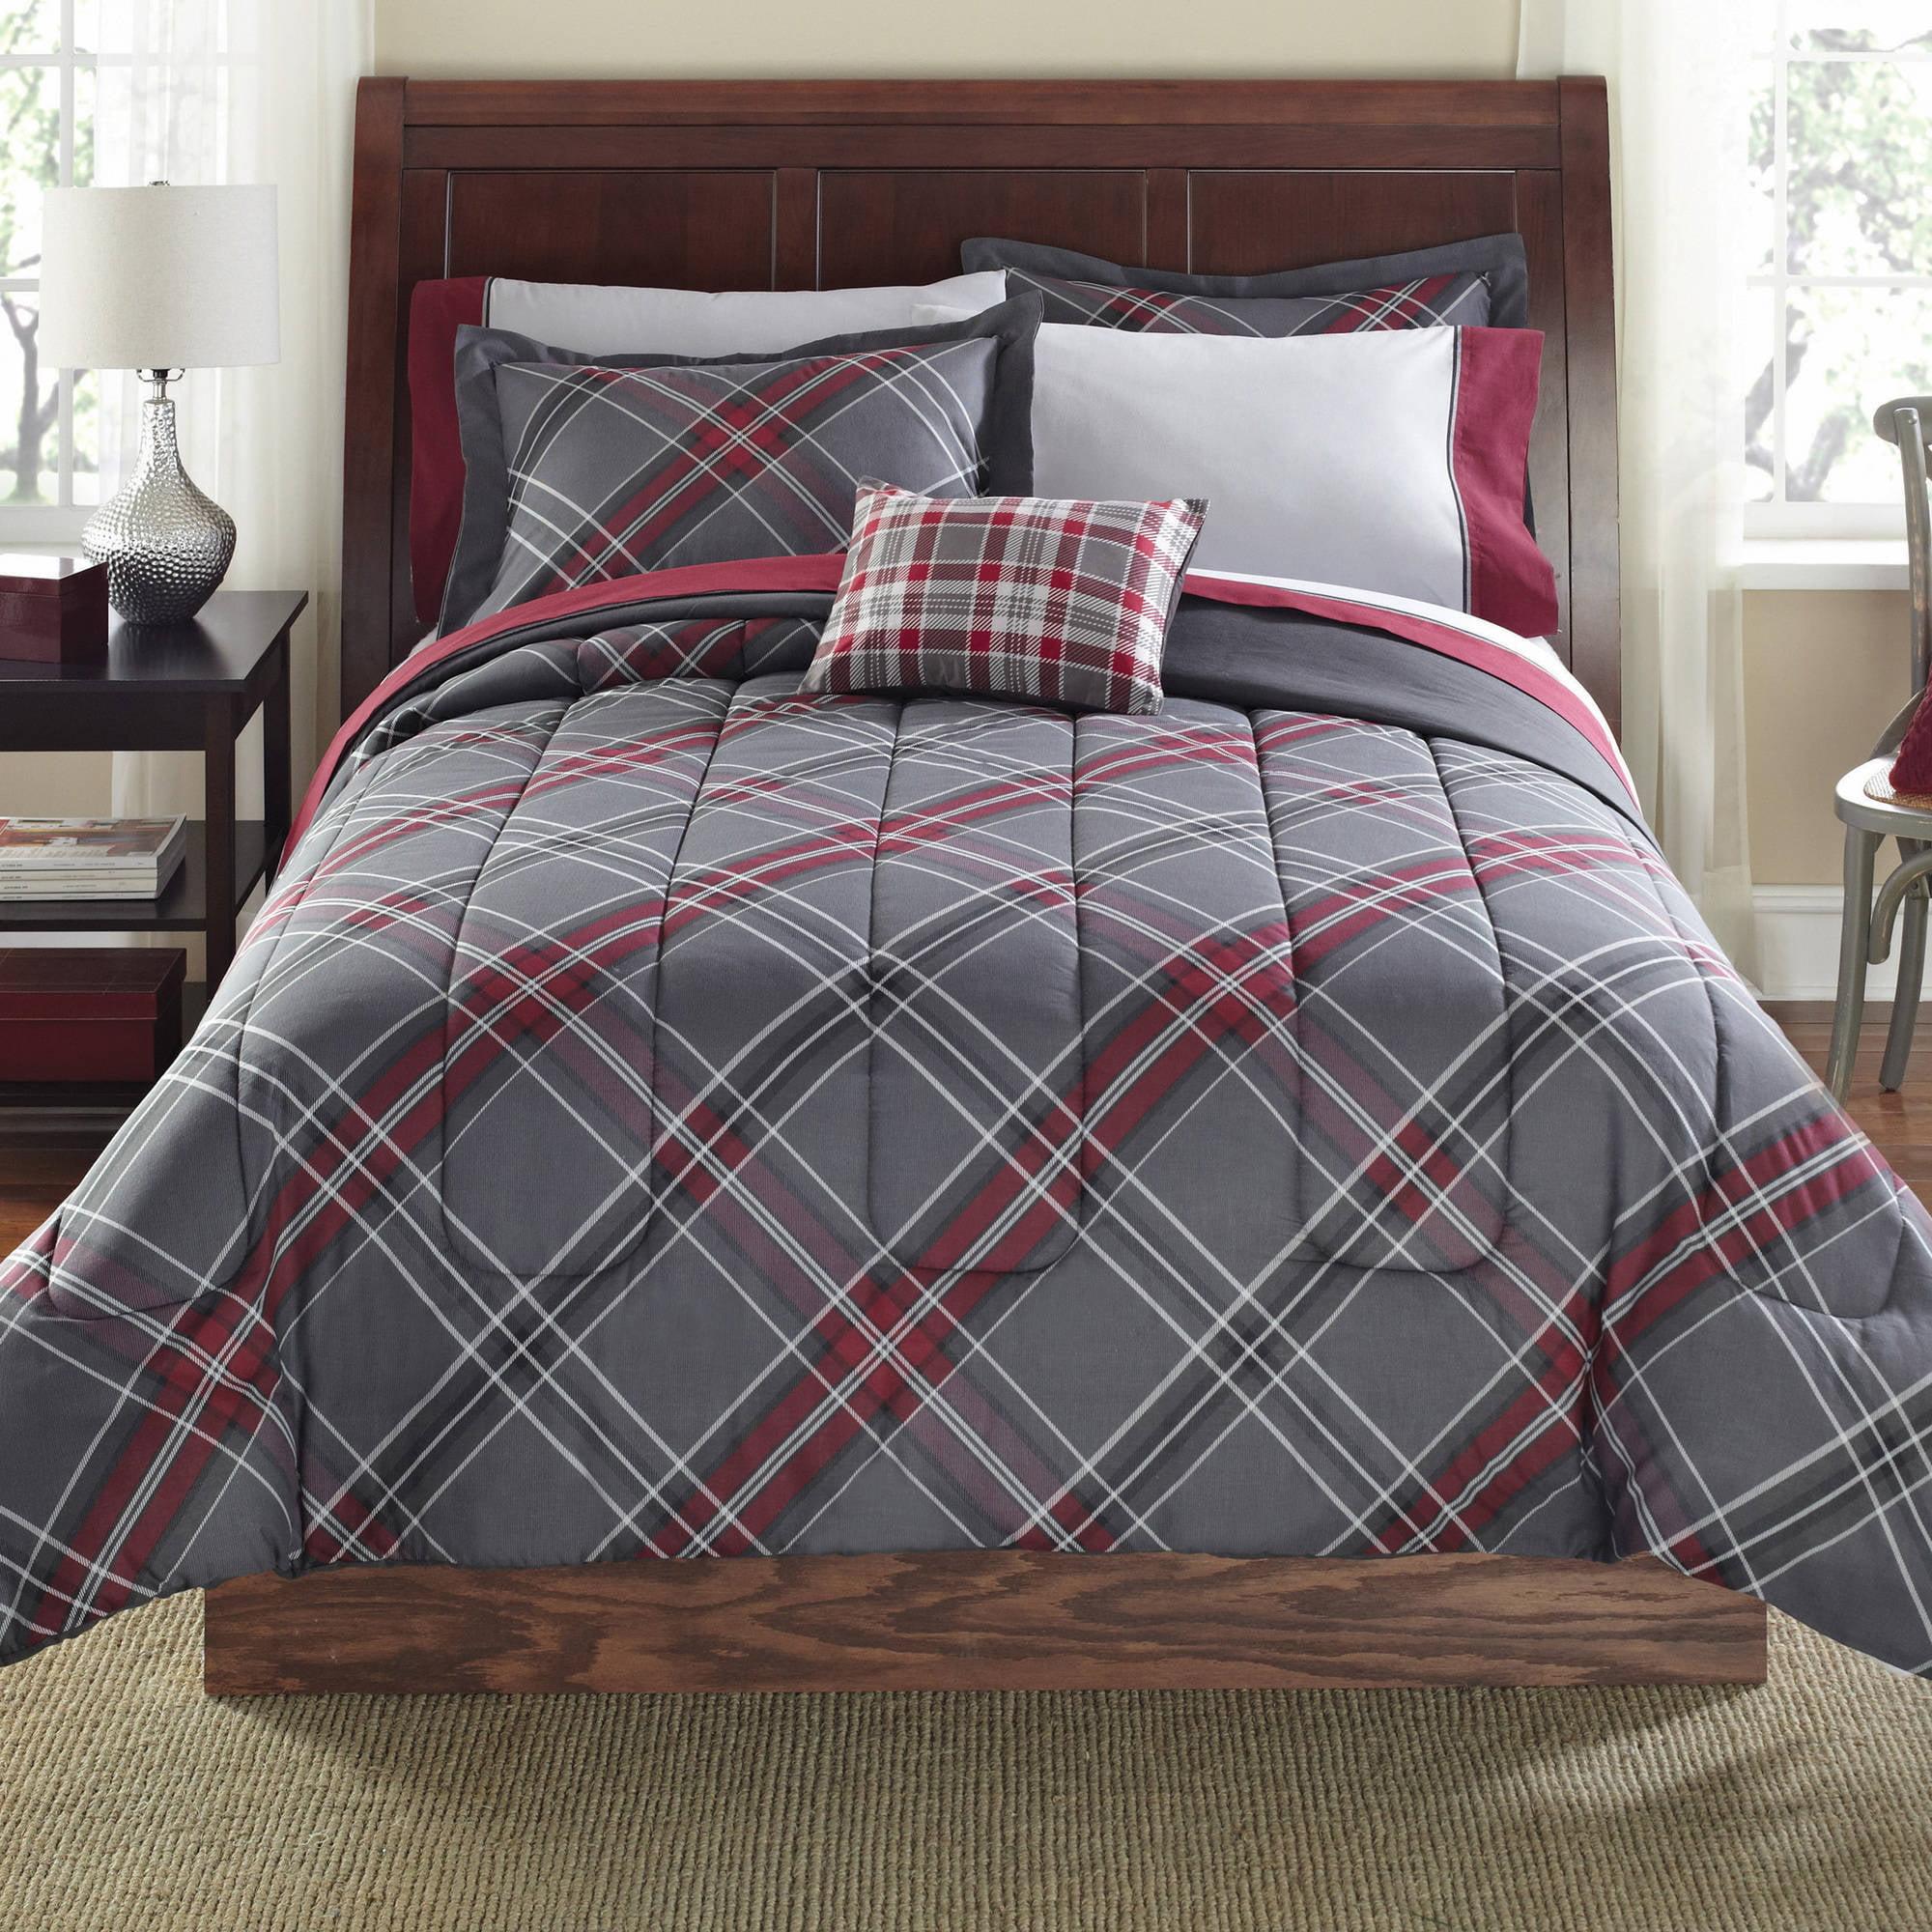 plaid comforter set king Mainstays 8 Piece Bed in a Bag Bedding Comforter Set, Grey plus  plaid comforter set king